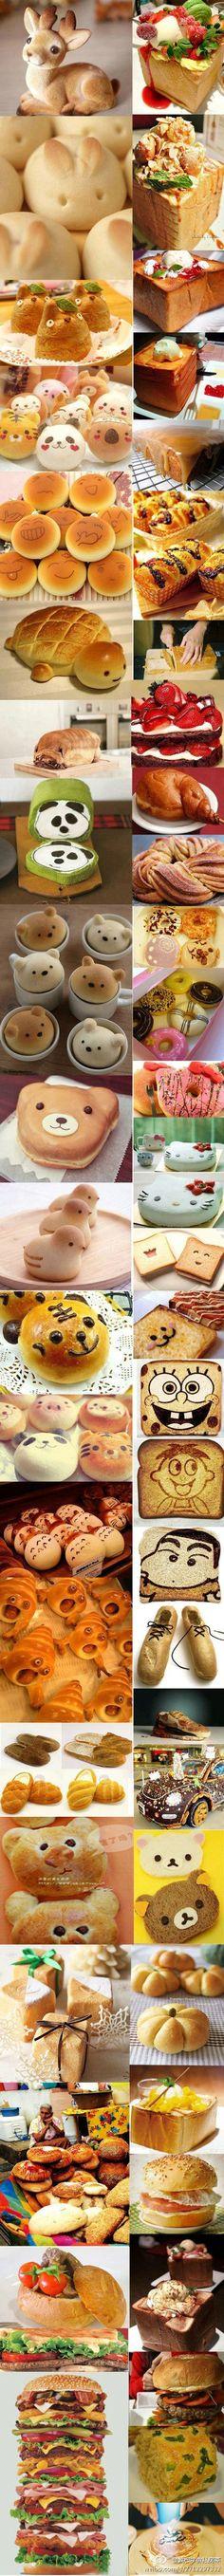 Bread!!!! (Baking Bread Funny)